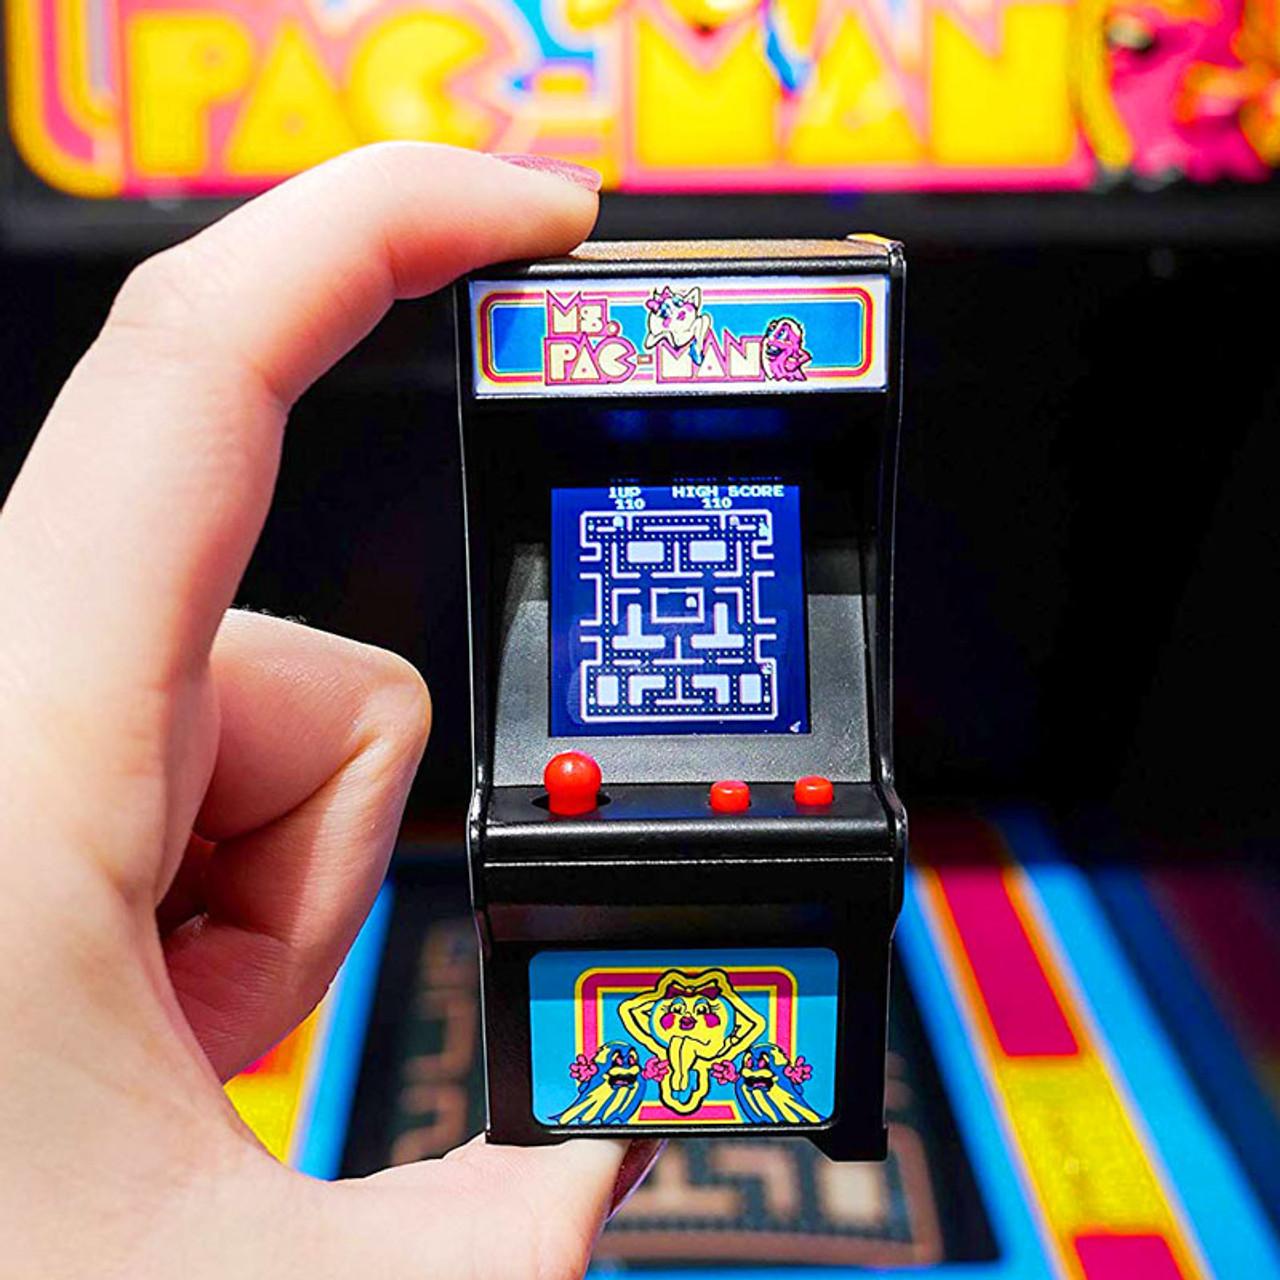 Ms. Pac-Man Tiny Arcade